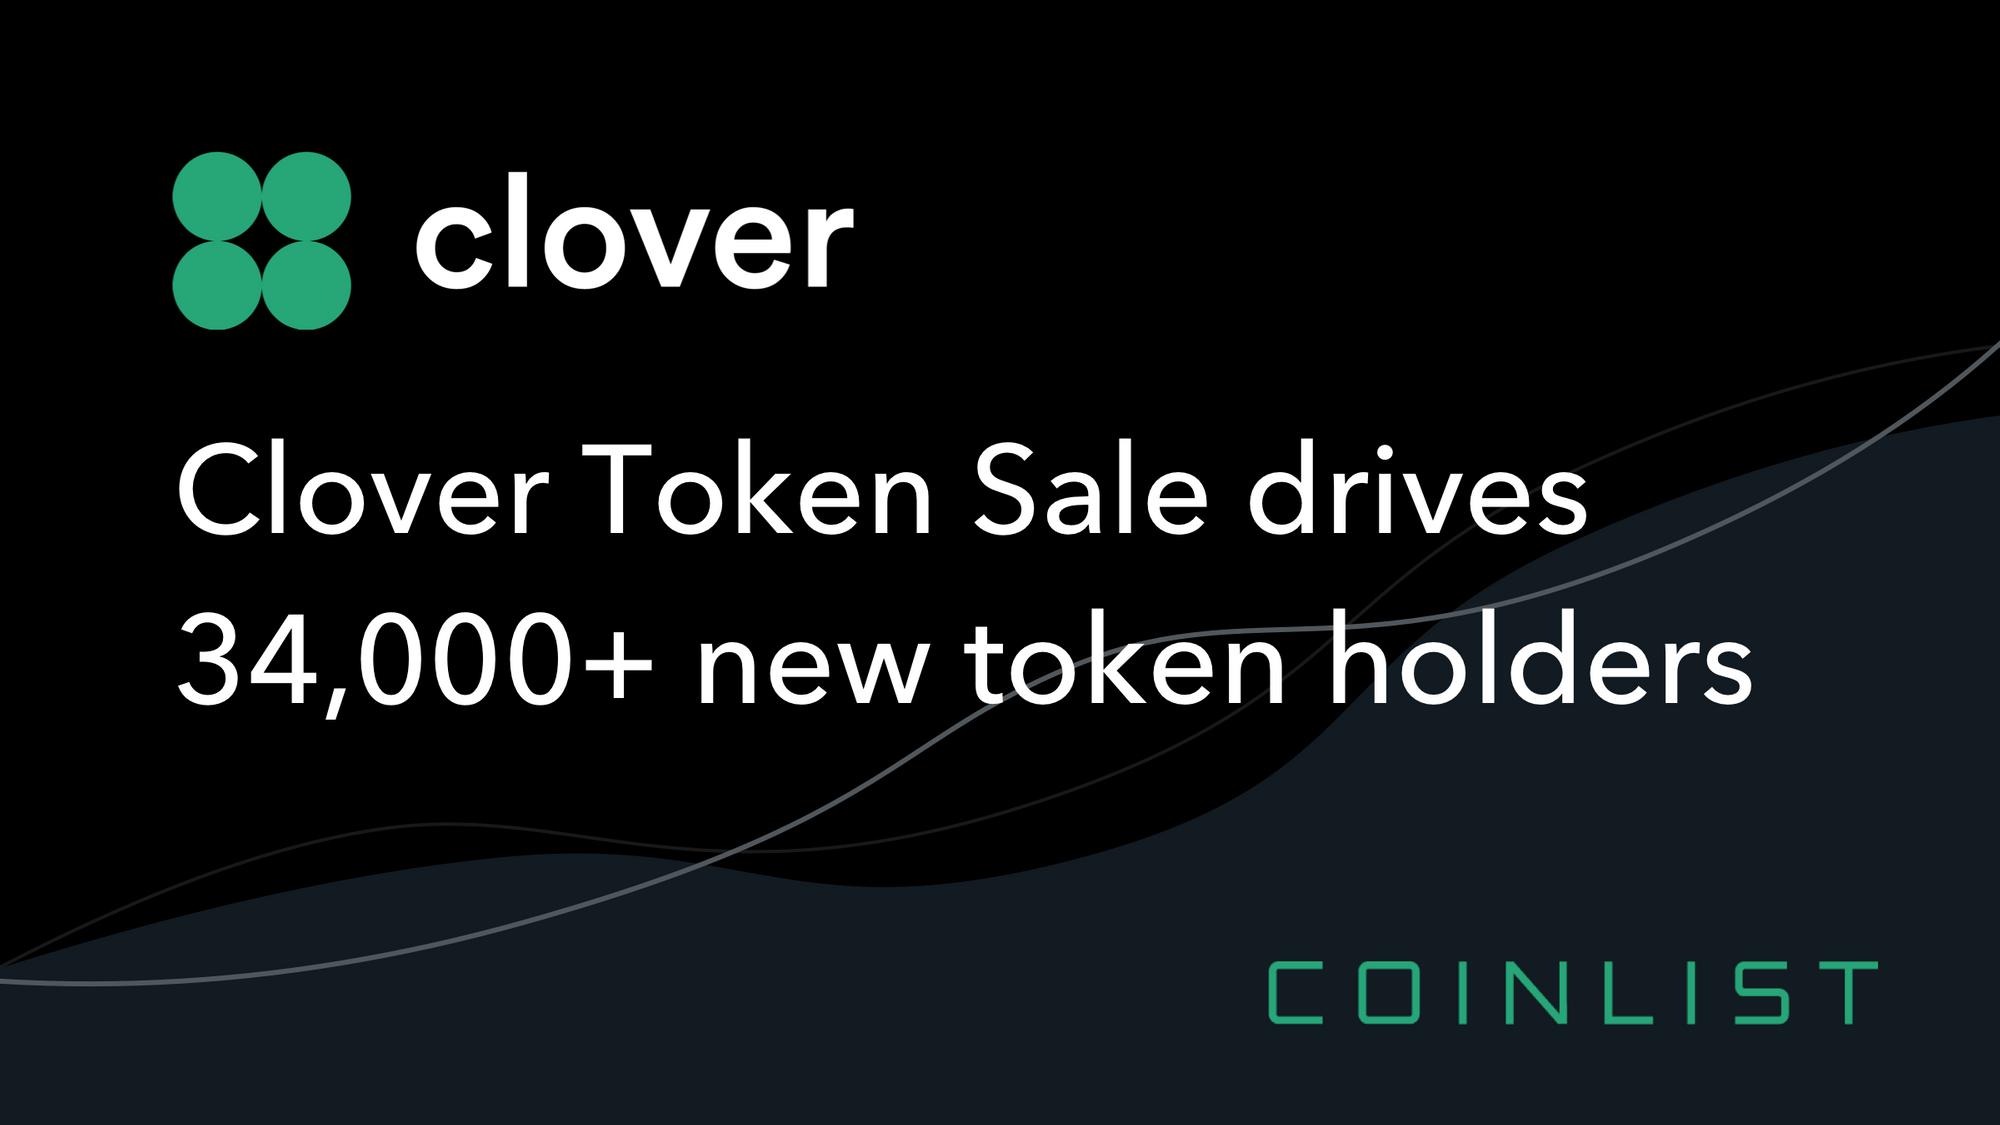 Clover Token Sale Drives 34,000+ New Token Holders